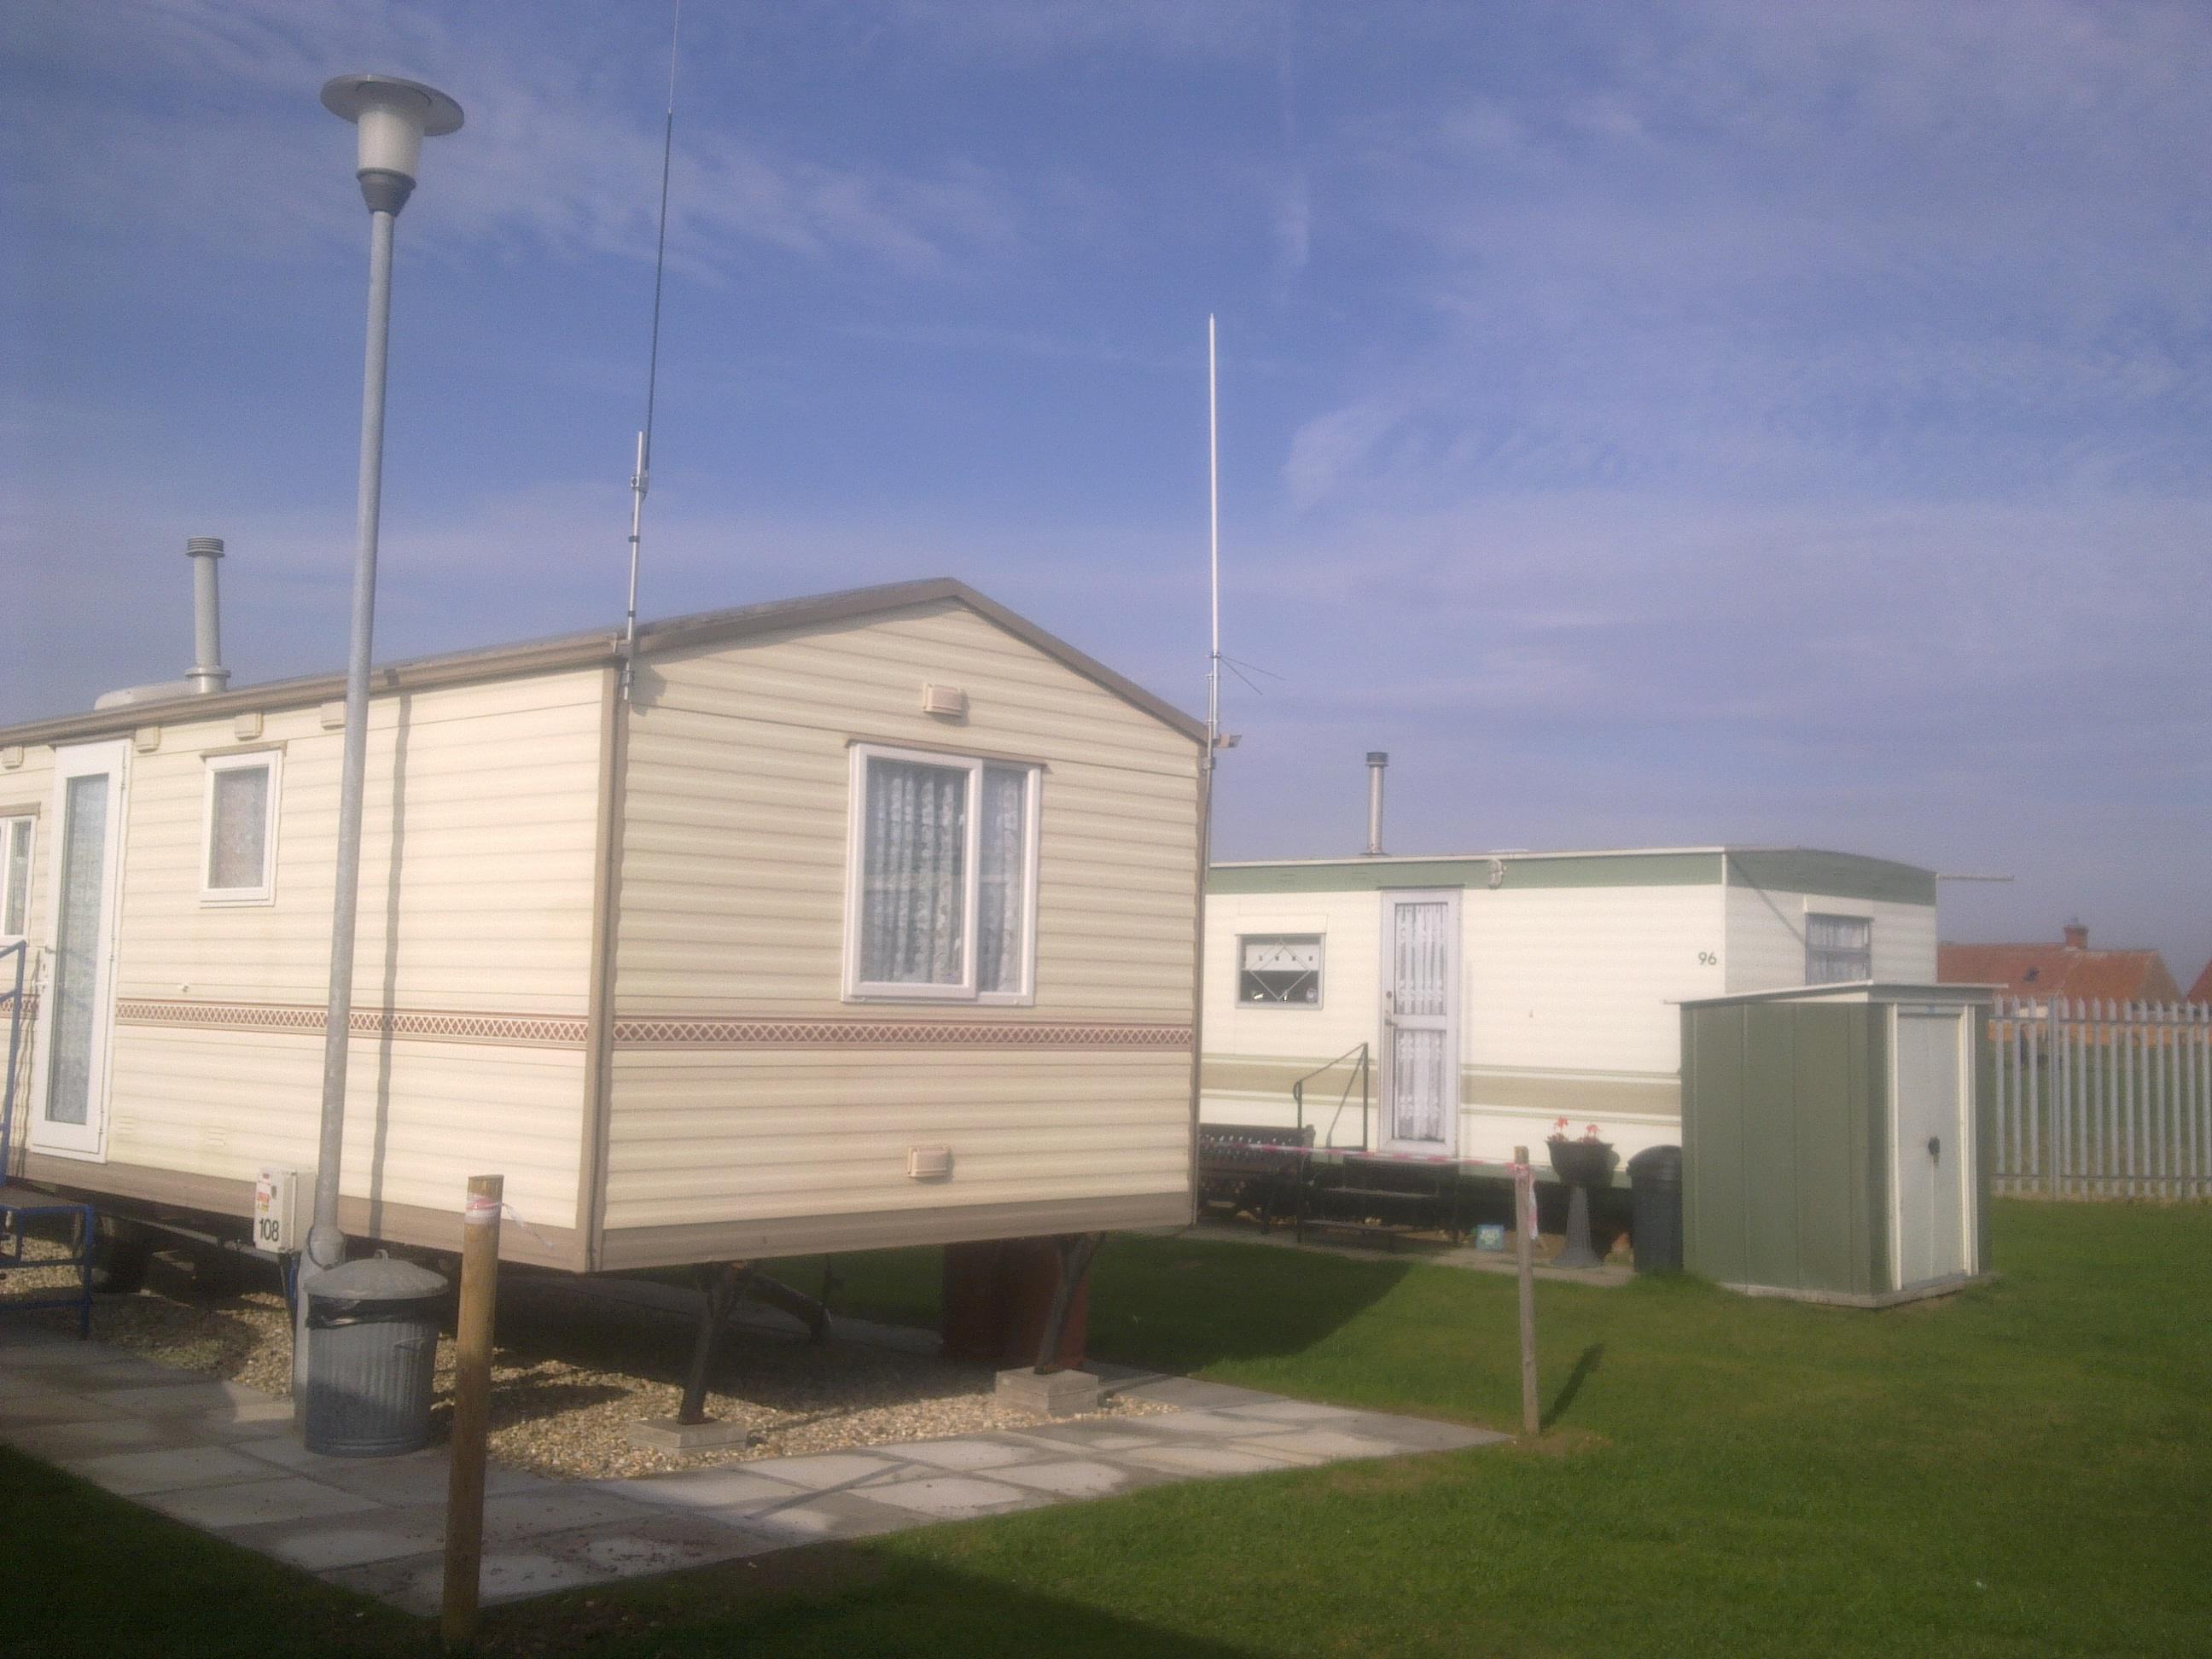 Caravan antennas